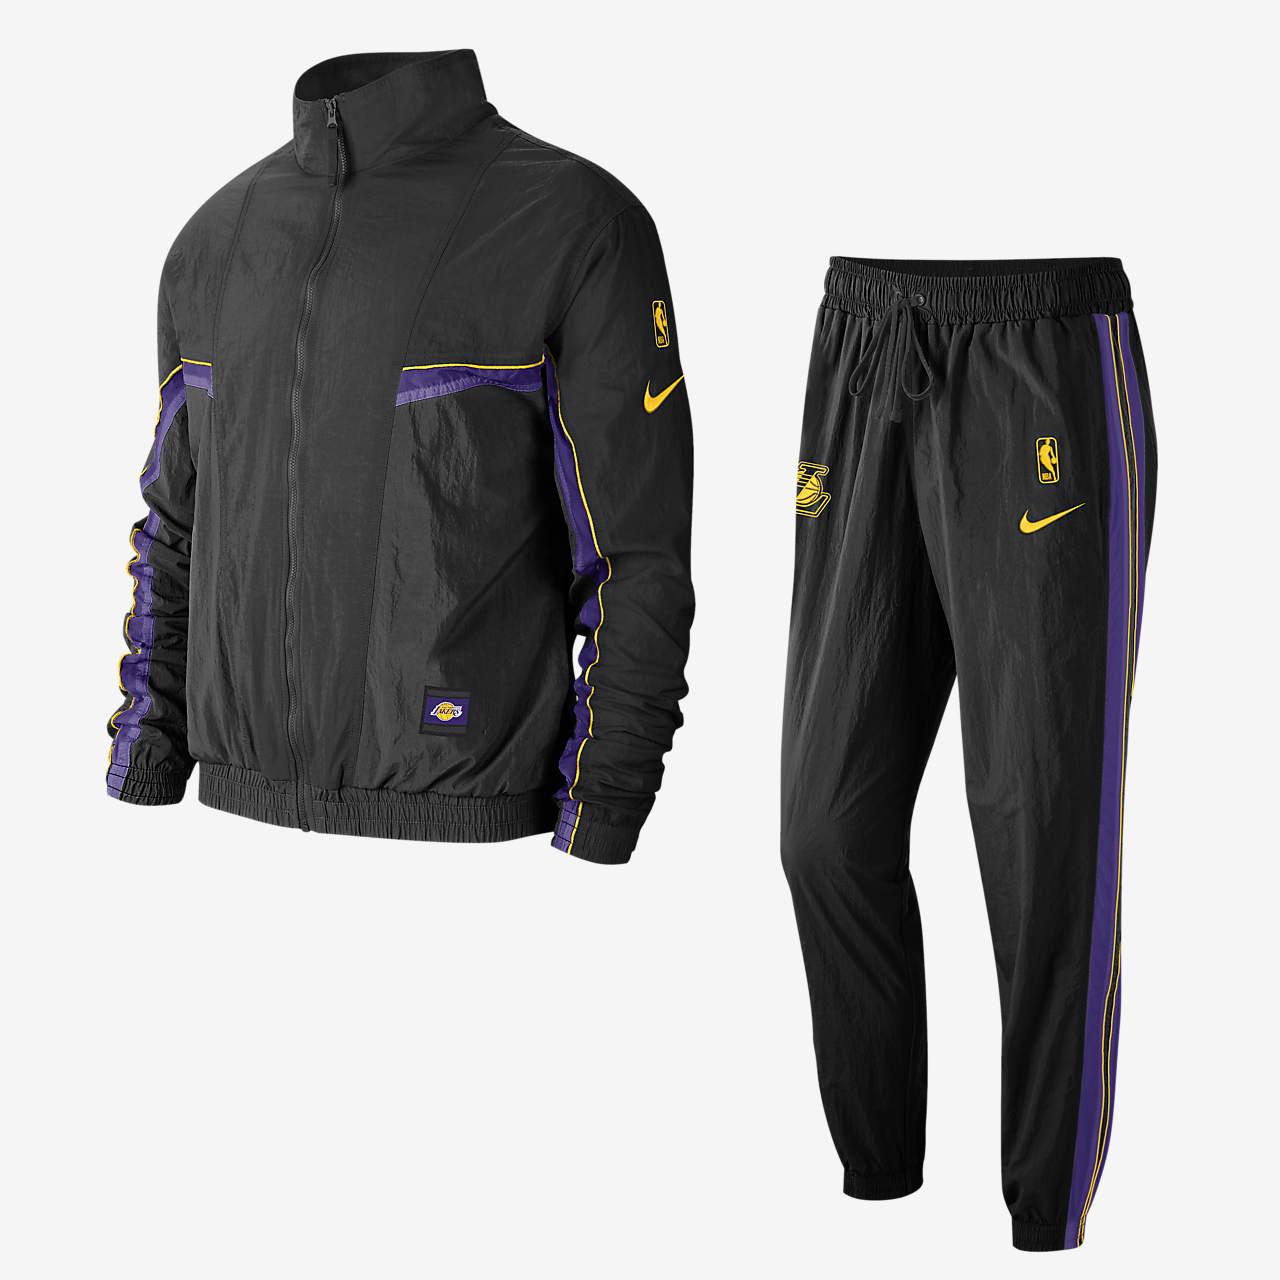 Los Angeles Lakers Courtside Men's Nike NBA Tracksuit